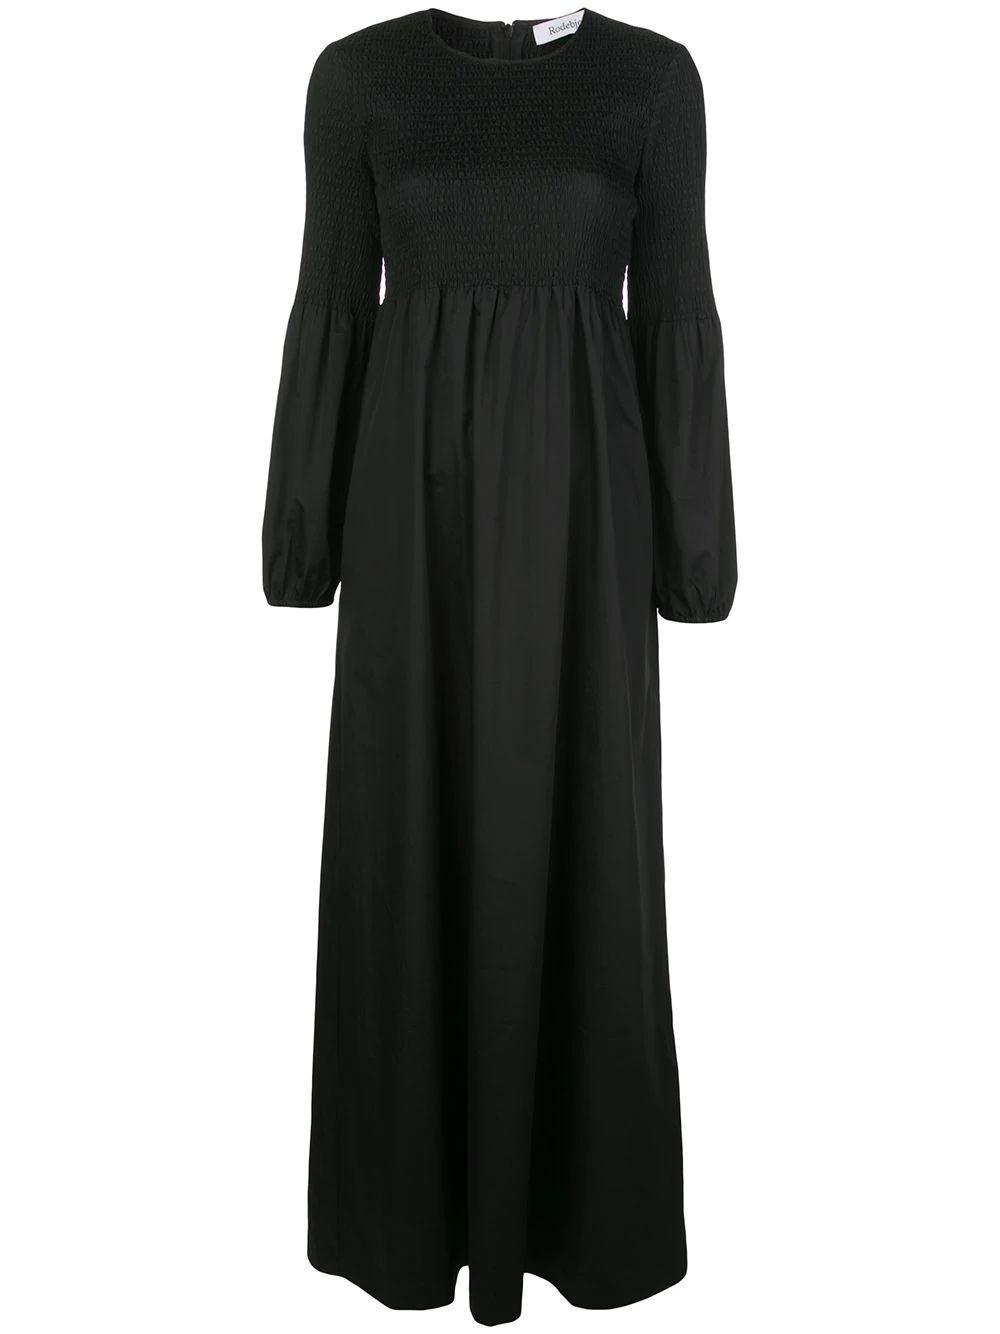 Sandy Crisp Smocked Maxi Dress